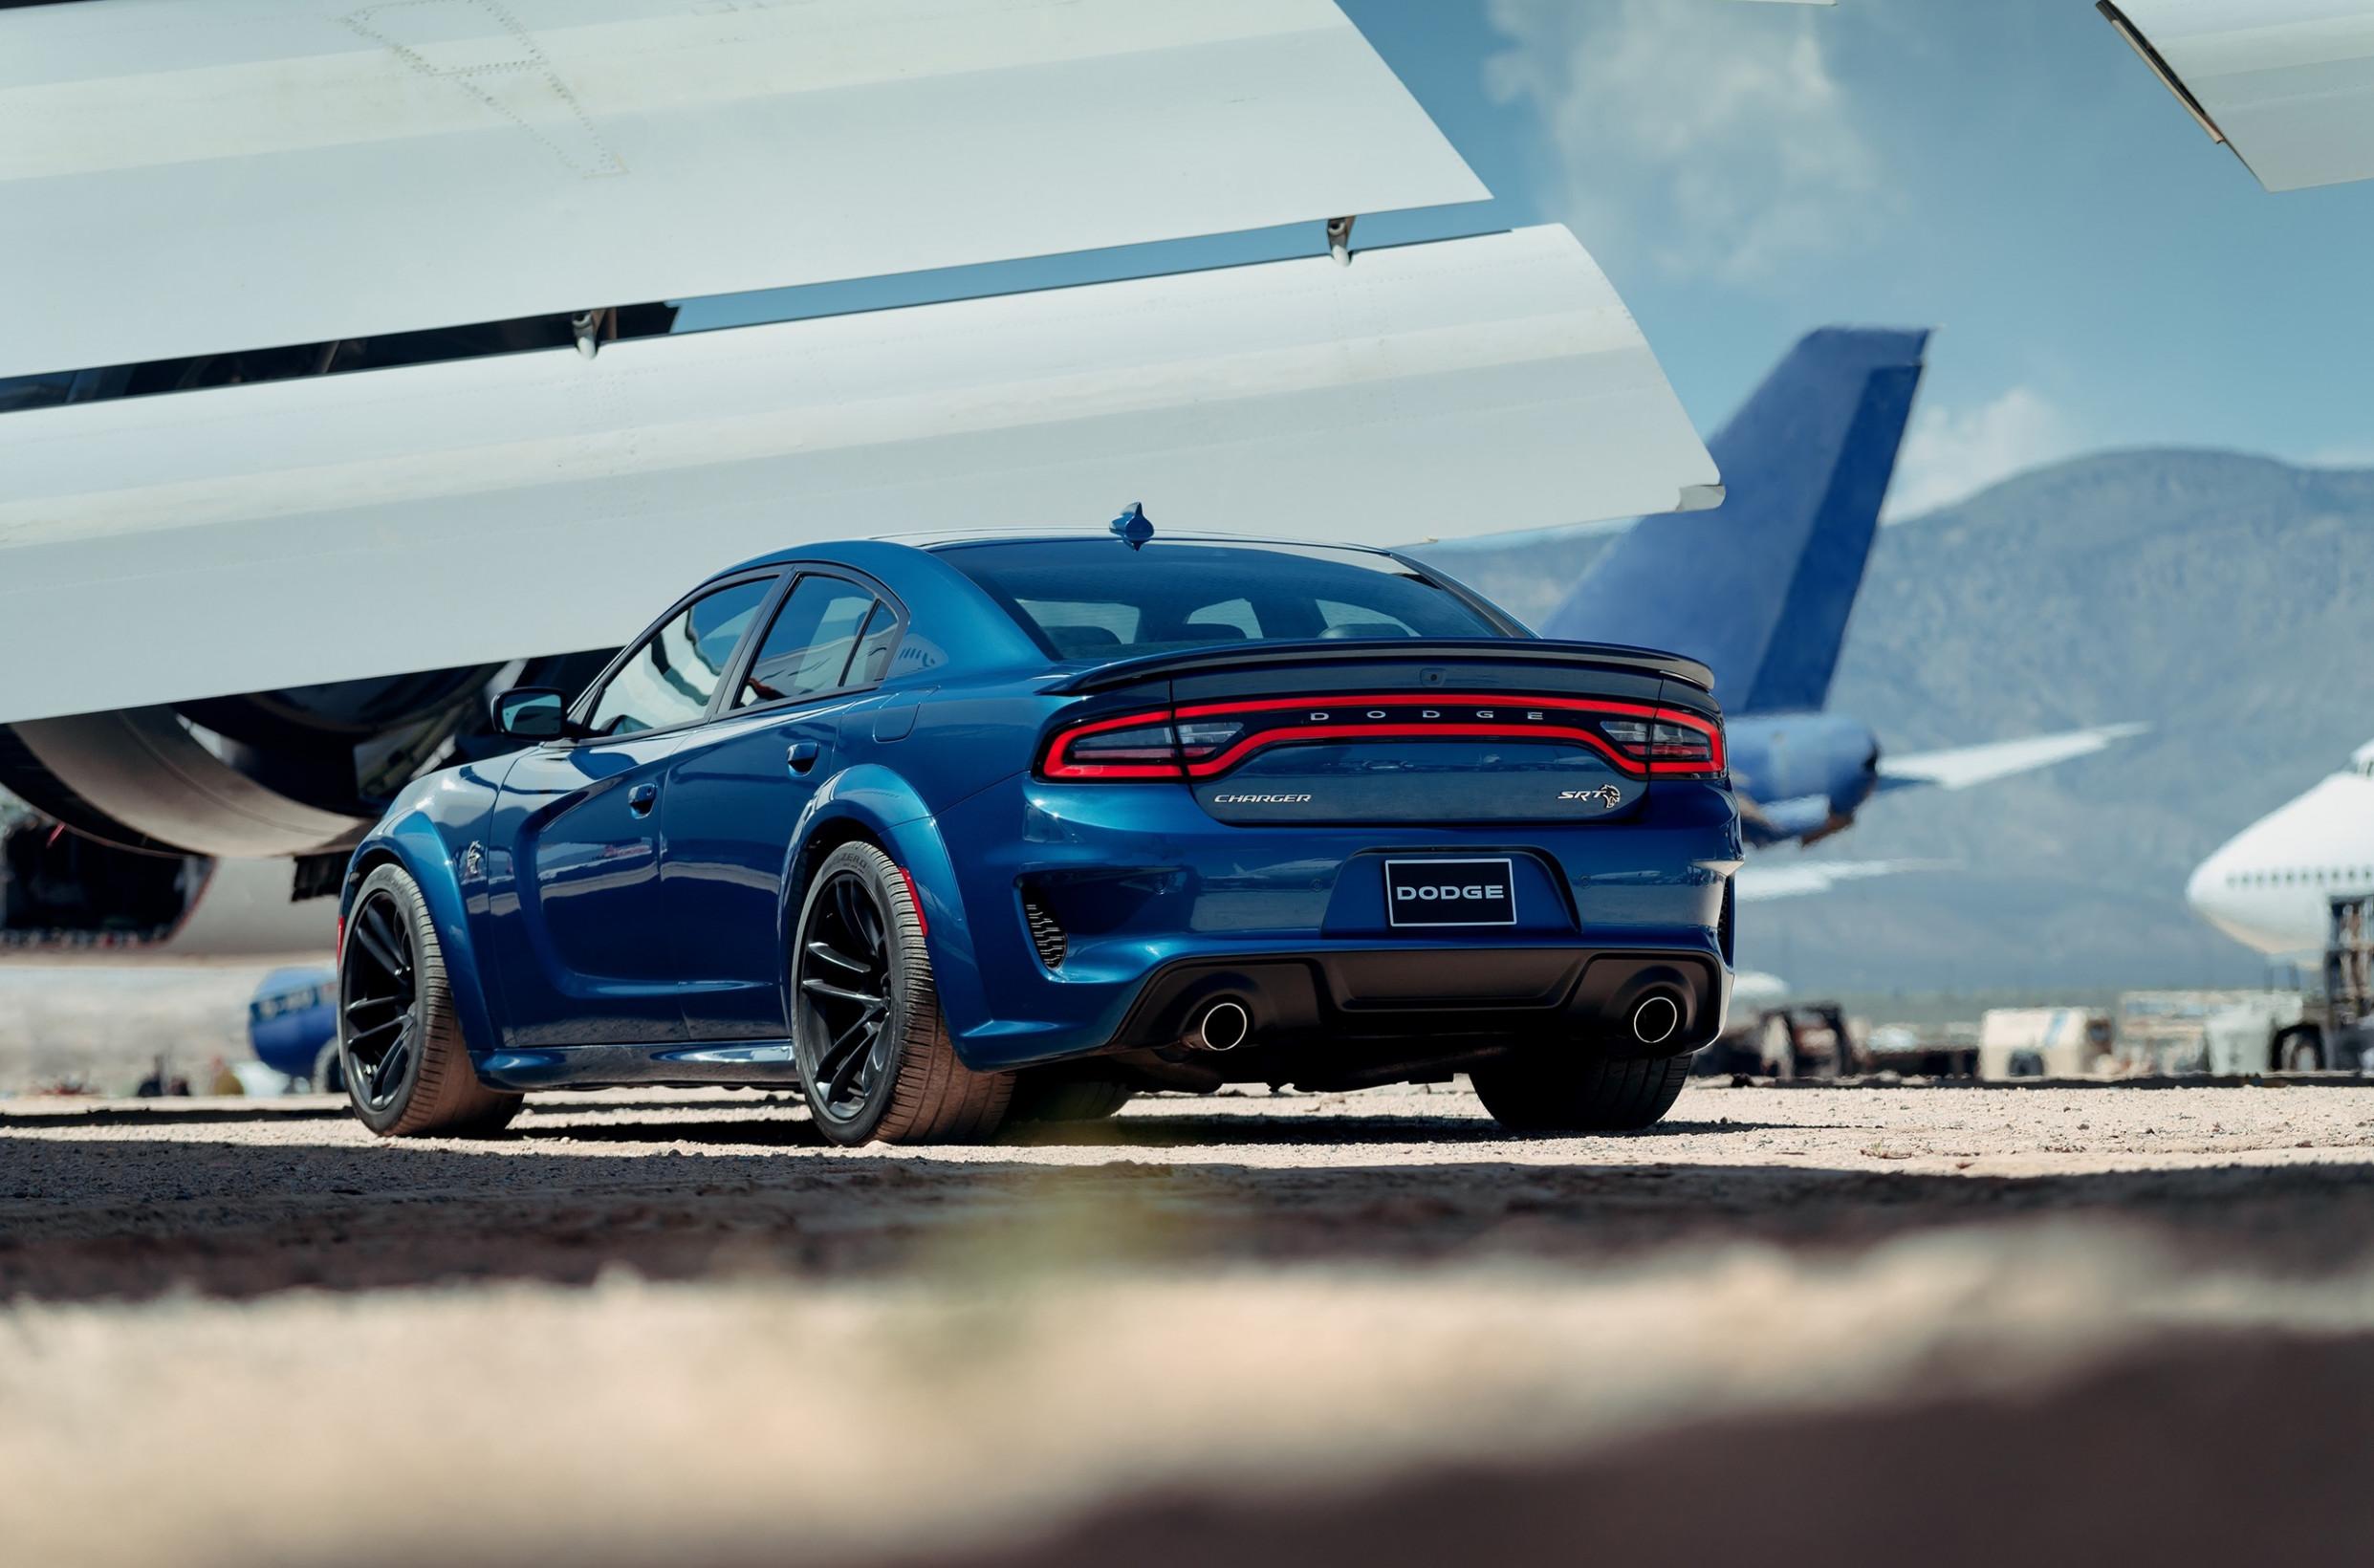 Review 2022 Dodge Dart SRT